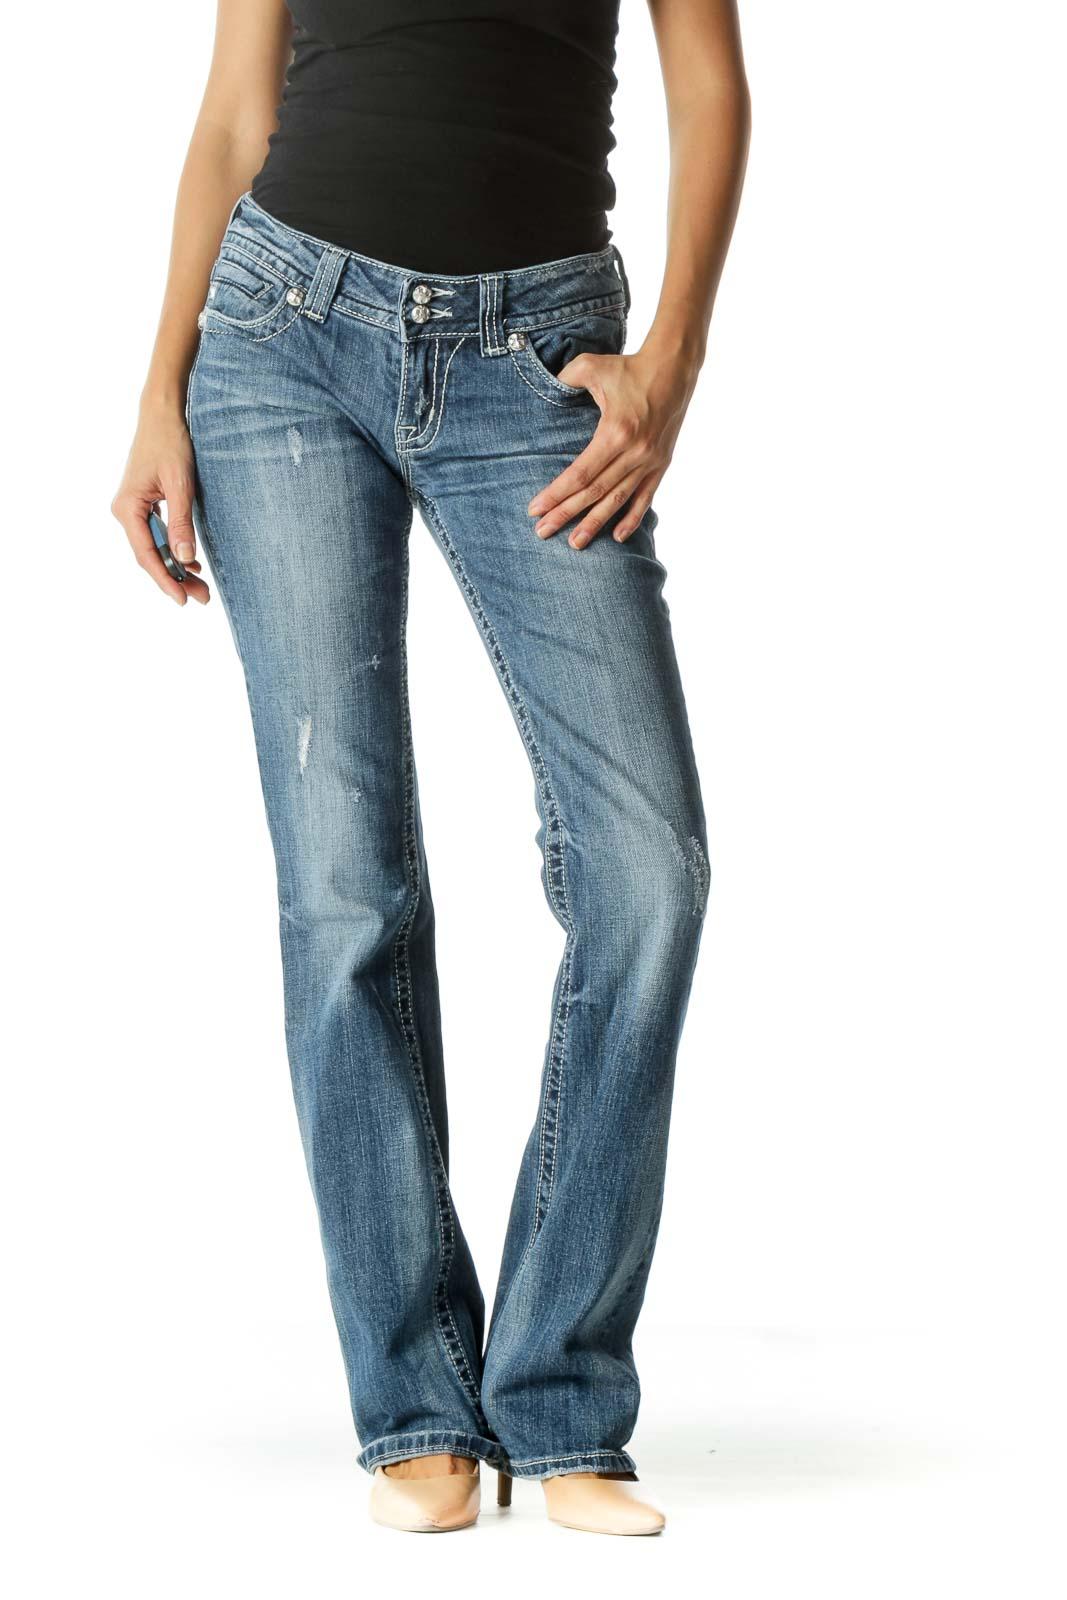 Blue Medium Wash Low Rise Jeans Front